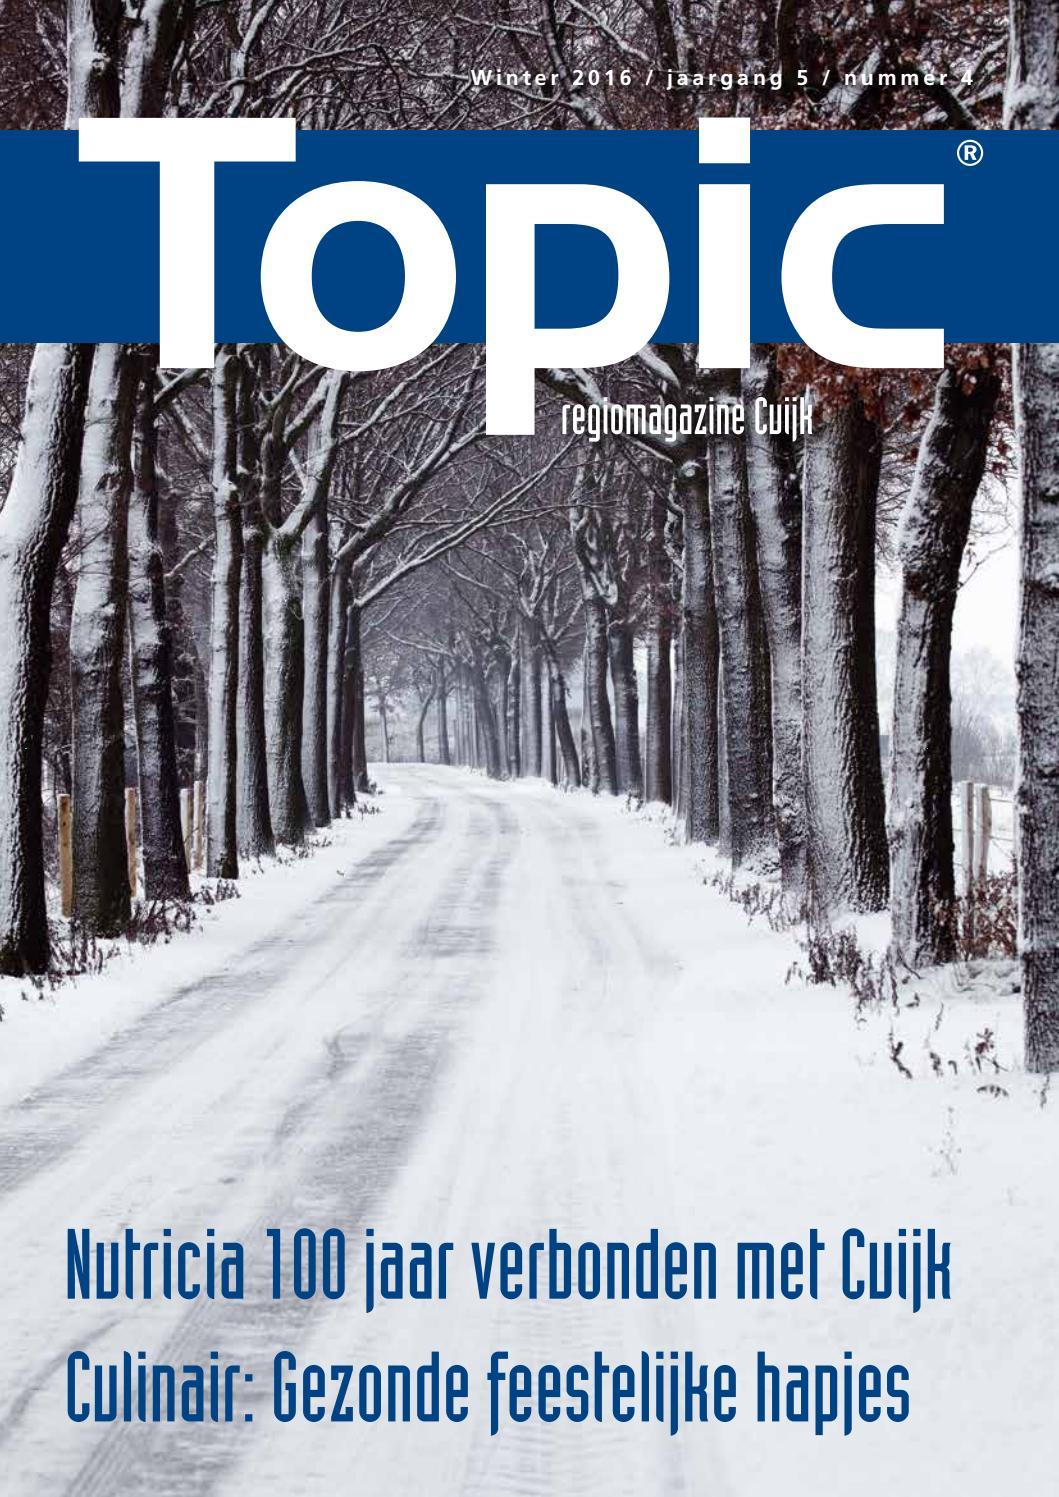 Topic cuijk winter 2016 by Remi van Bergen - issuu